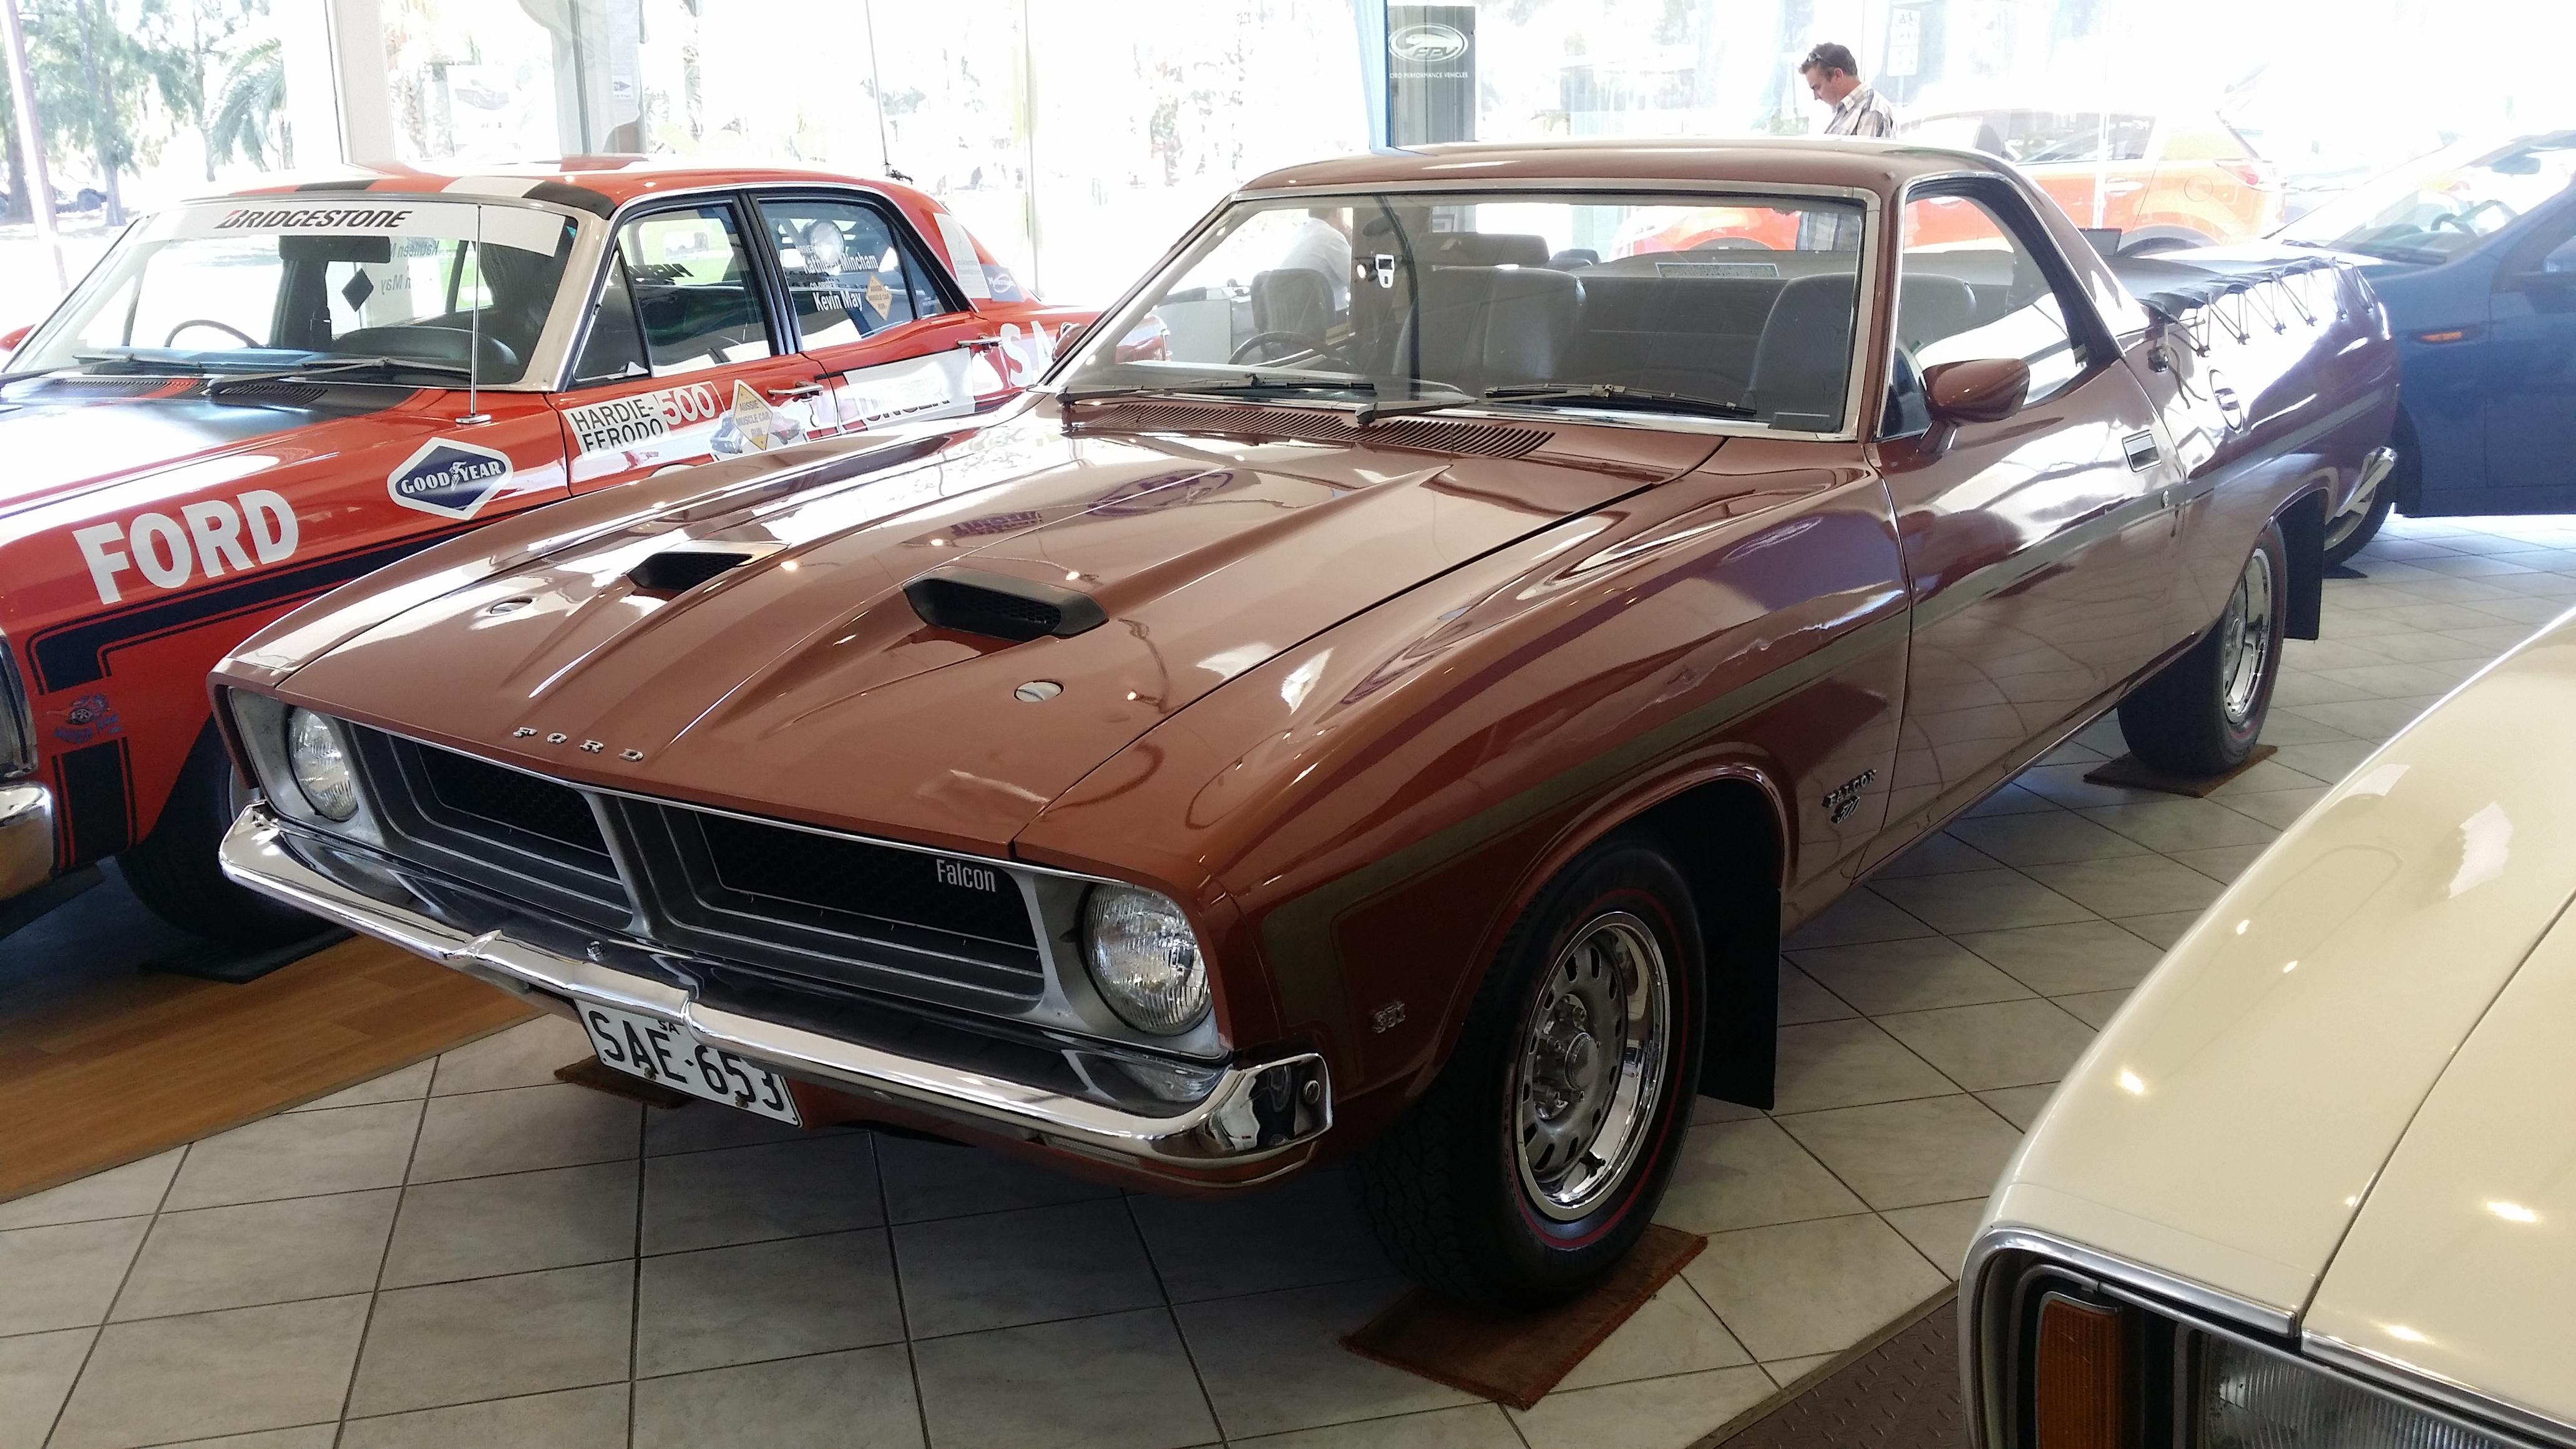 Ford_Falcon_500_GS_351_Ute_(XB_Series)_(16463970799).jpg